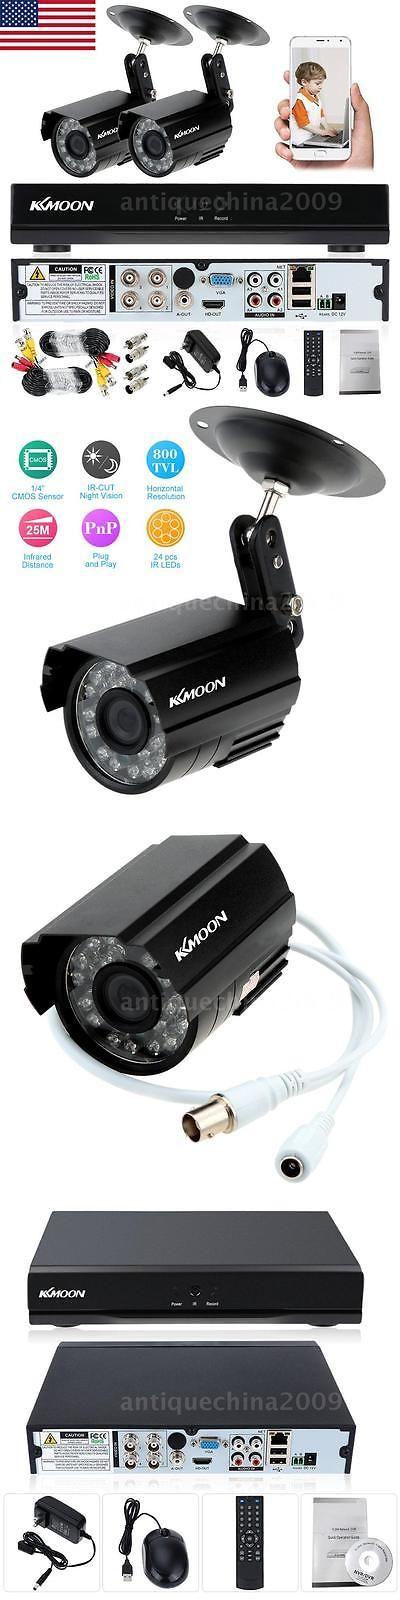 Surveillance Security Systems: 4Ch 960H P2p Hdmi Dvr 800Tvl ...